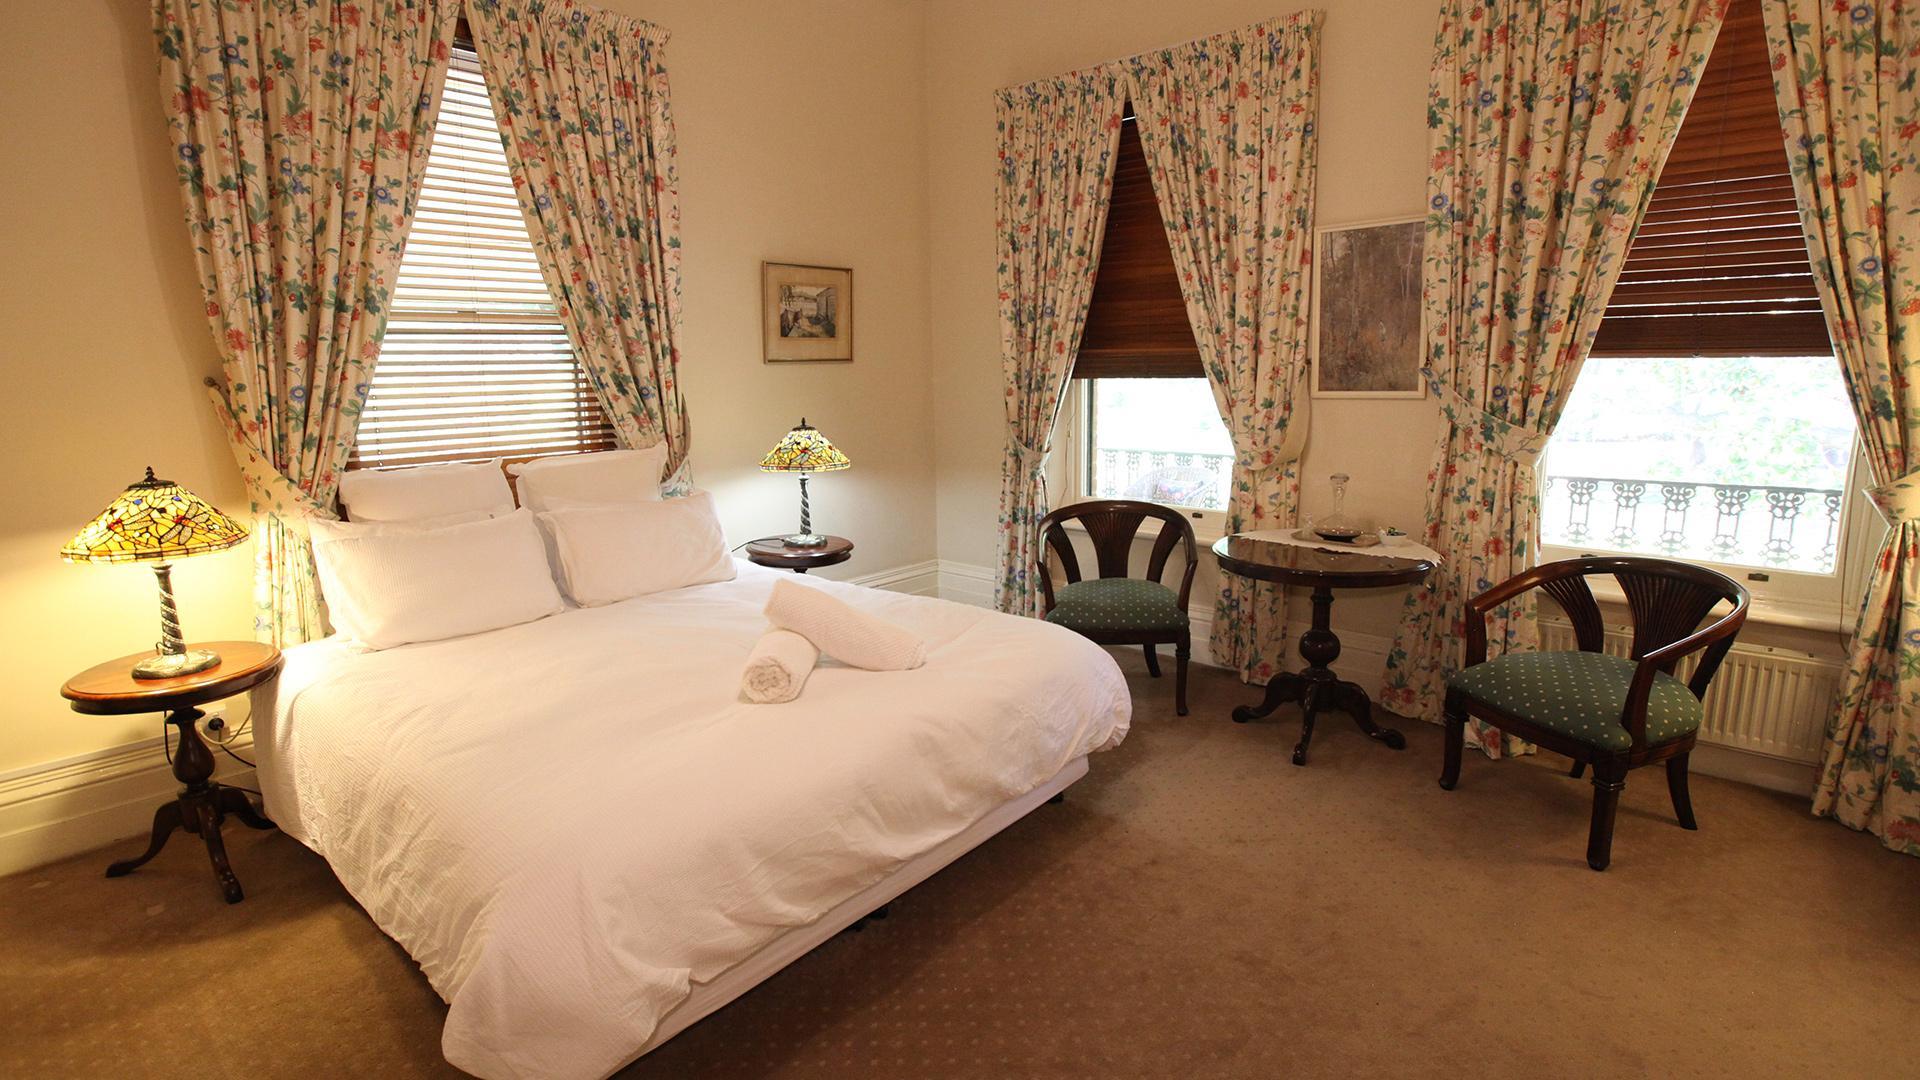 Suite image 1 at Koendidda Country House by Indigo Shire, Victoria, Australia